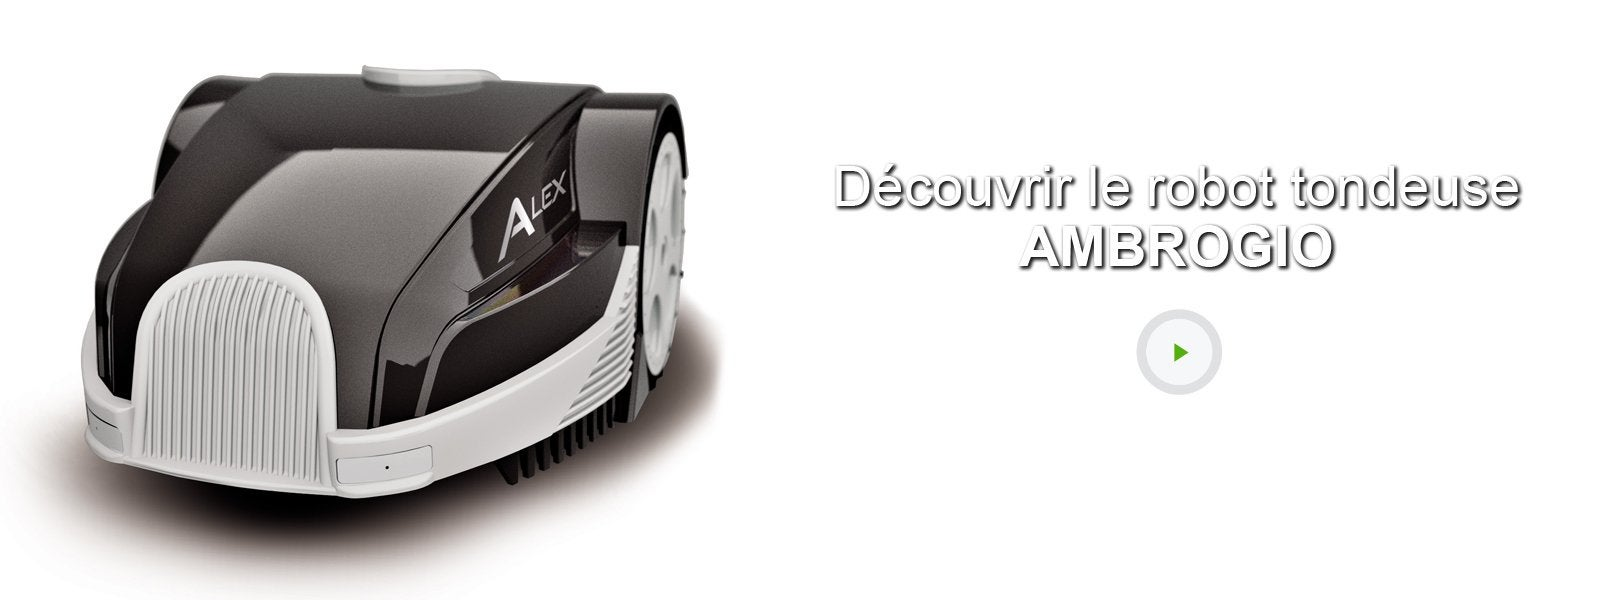 tondeuse robot connect e ambrogio l30 alex 500 m leroy. Black Bedroom Furniture Sets. Home Design Ideas